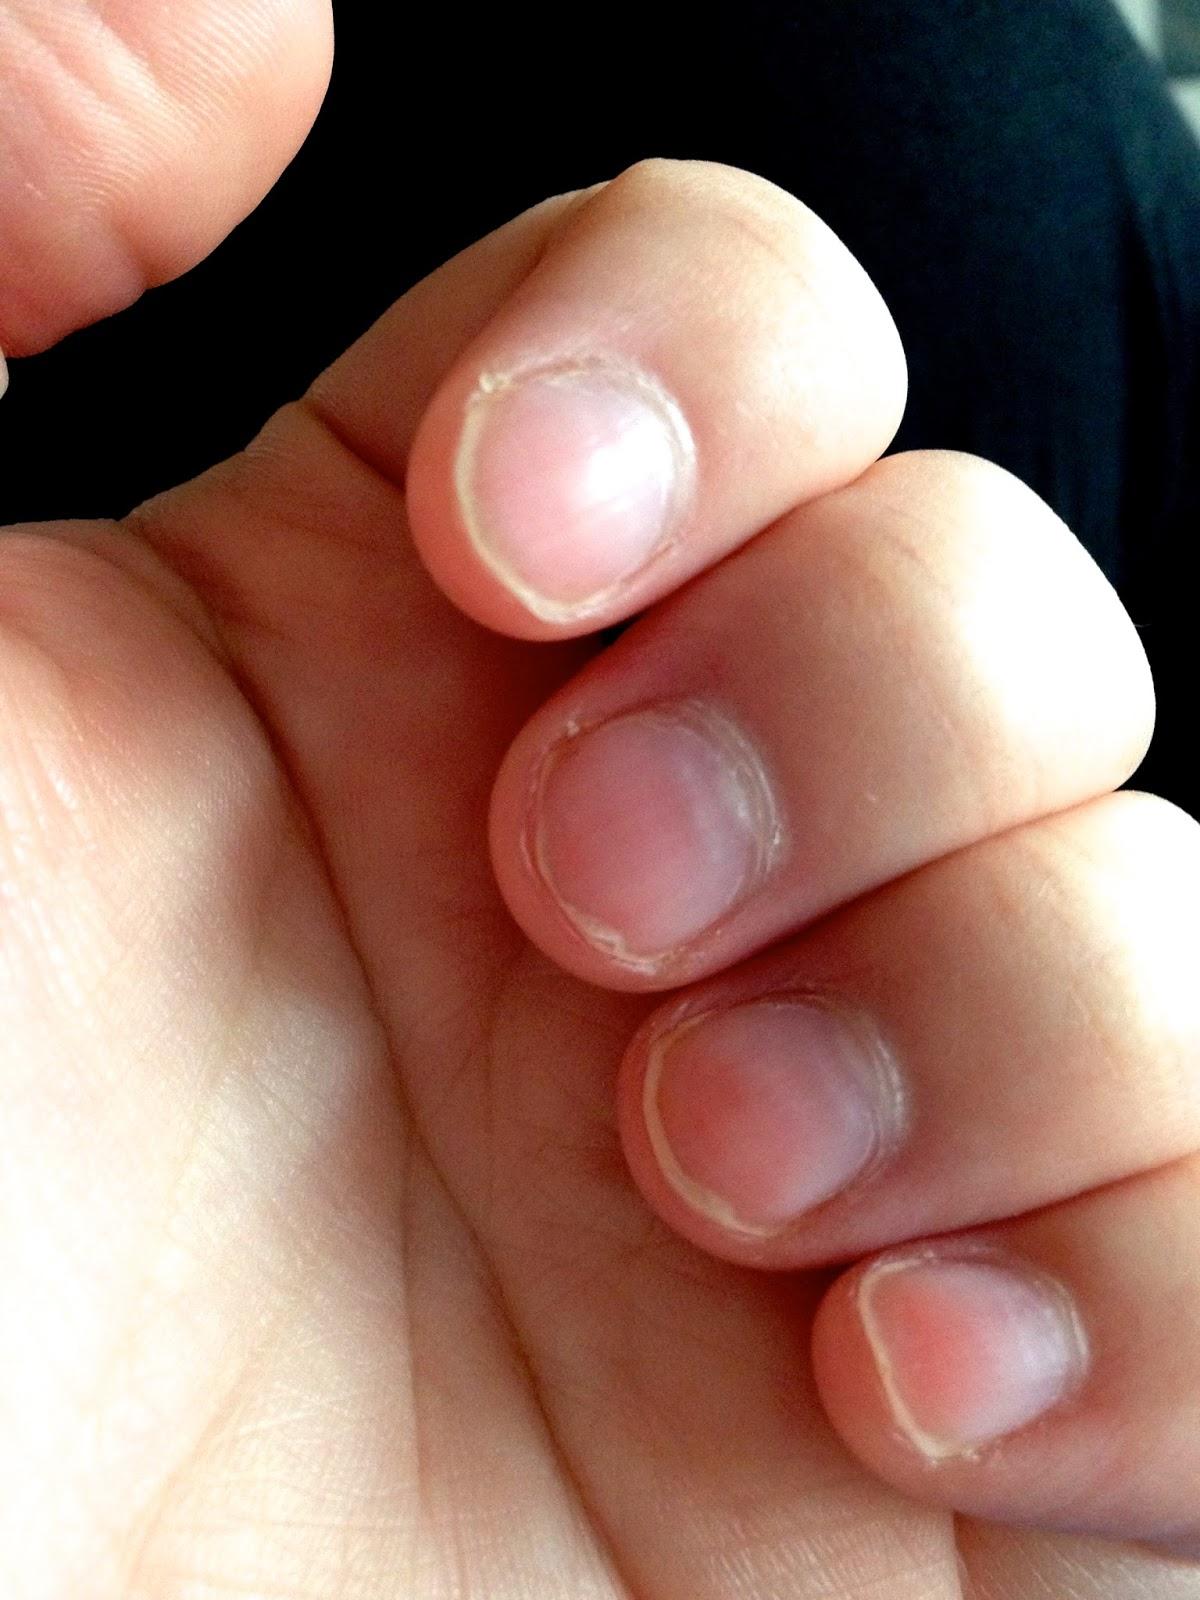 mina naglar skivar sig